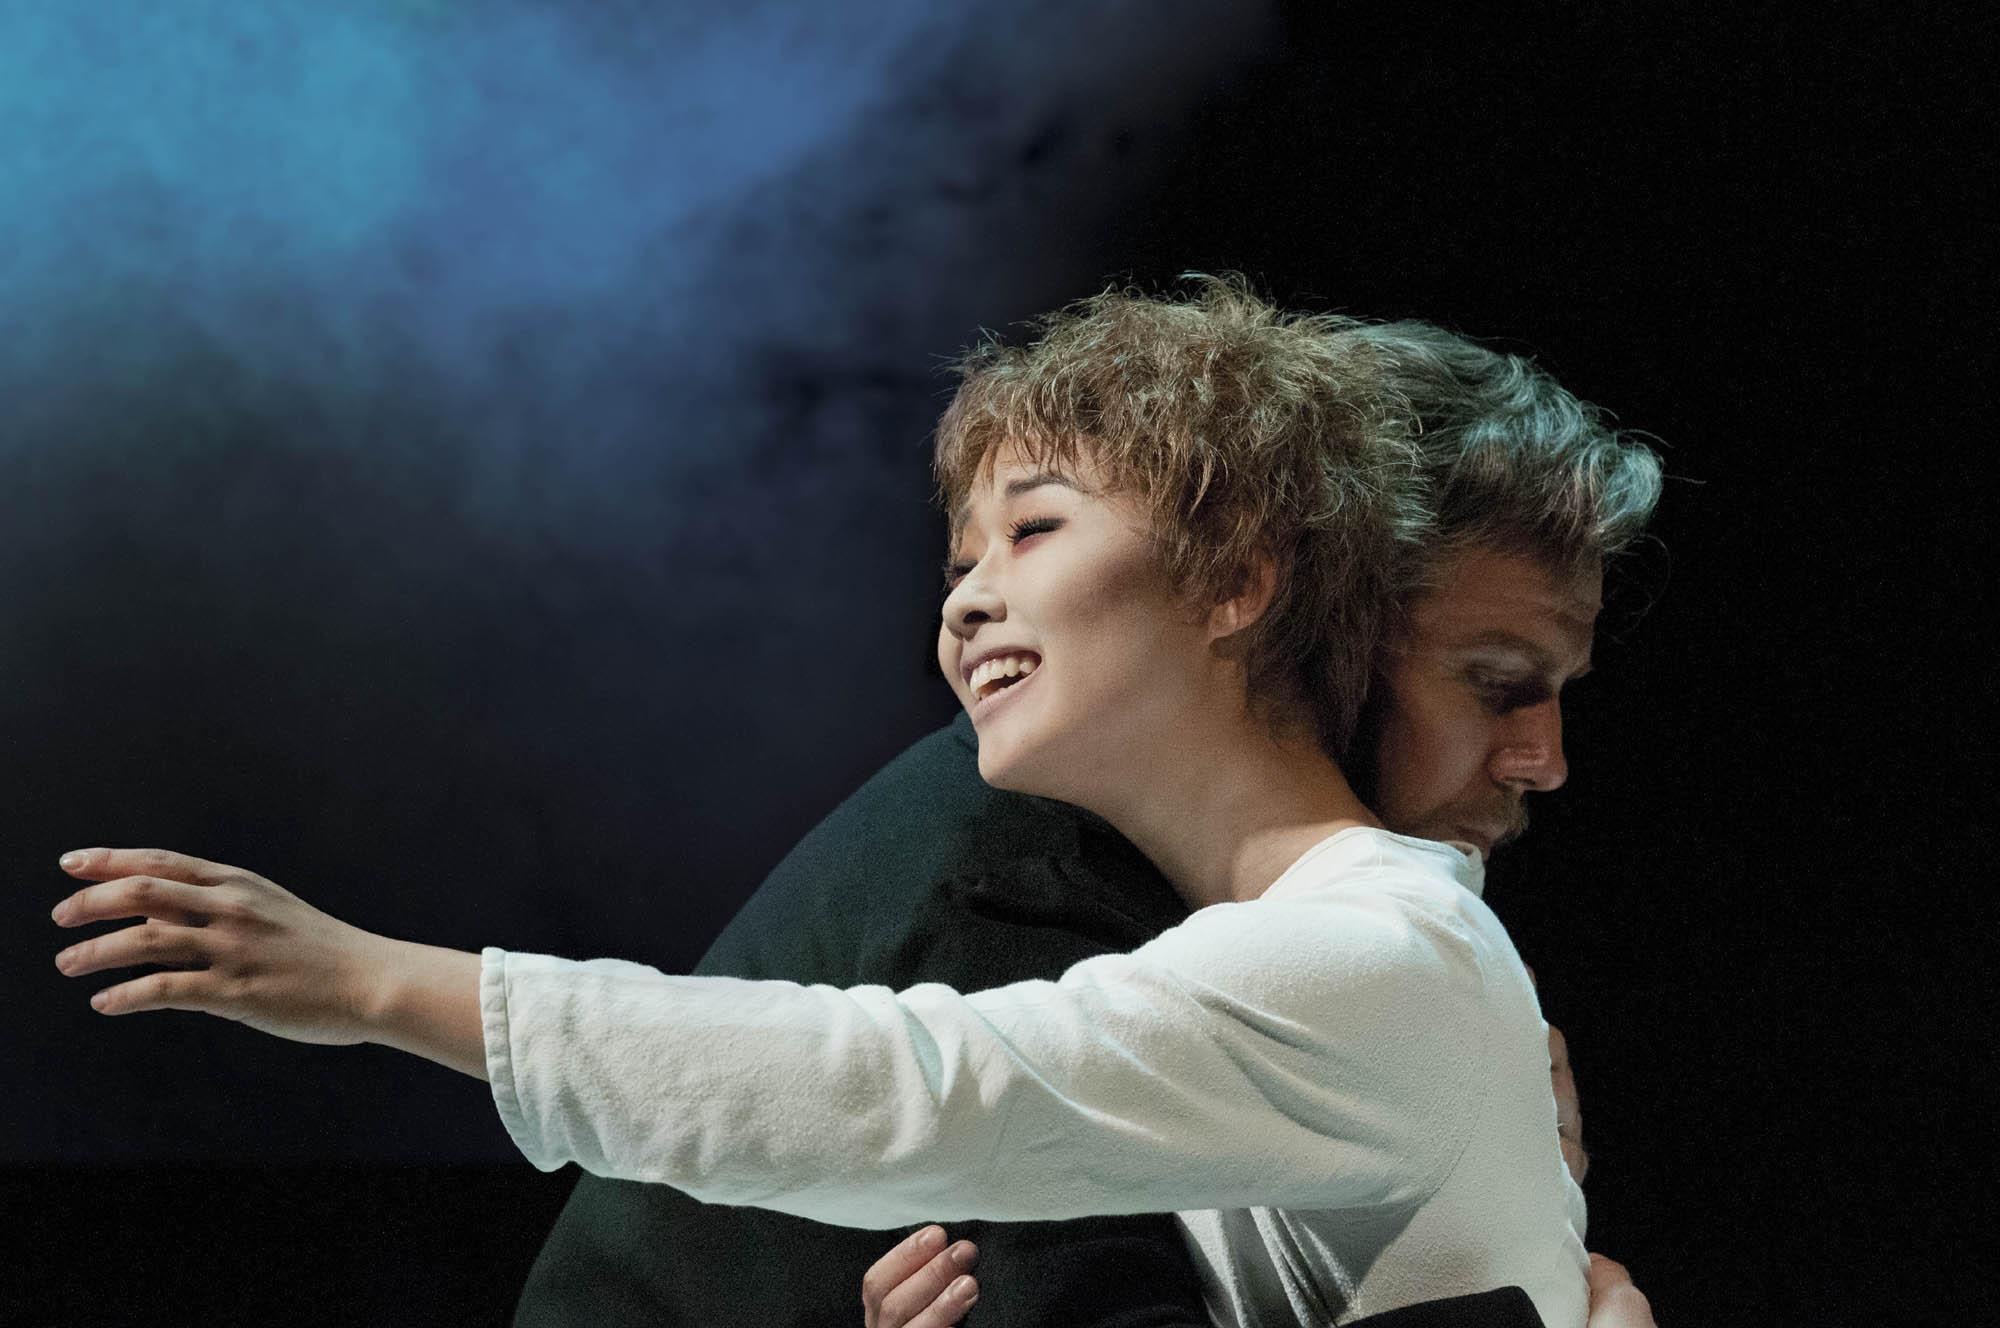 Les Miserables Na-Young Jeon (Fantine) & Daniel Koek (Valjean) 08.13 DSC_8612 Photo Michael Le Poer Trench Copyright CML_용량줄임